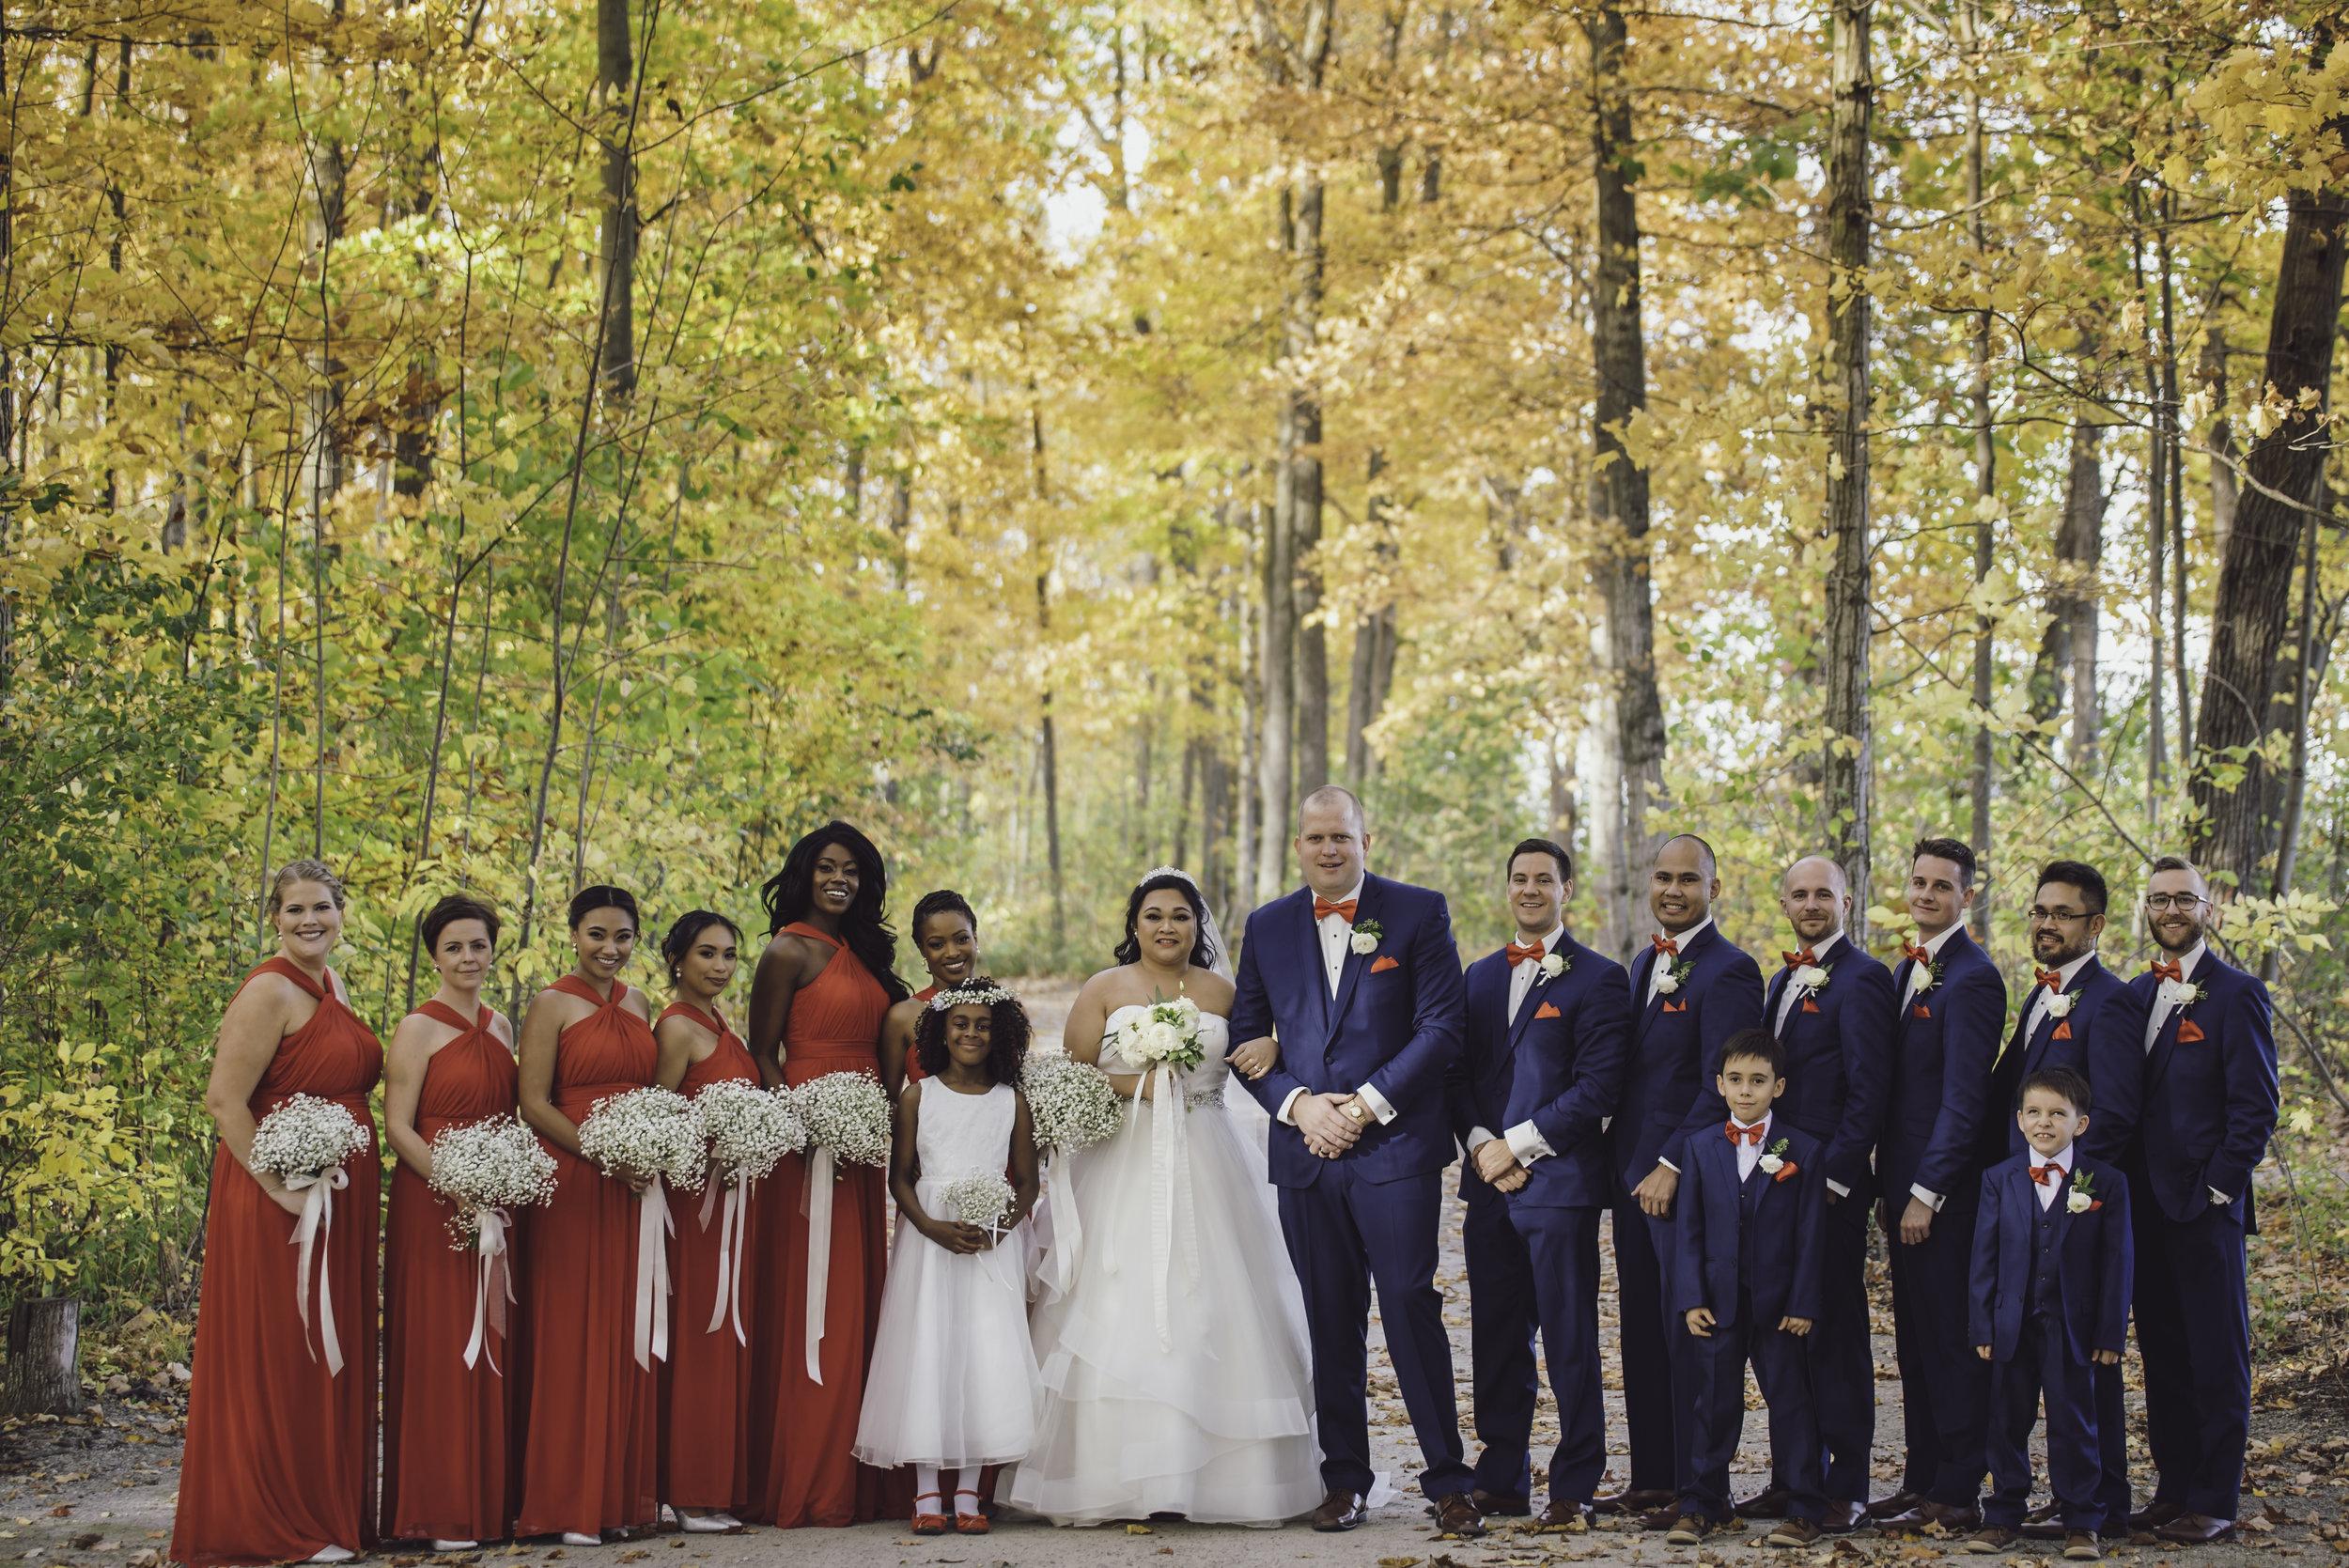 Will&Steph wedding -436.jpg